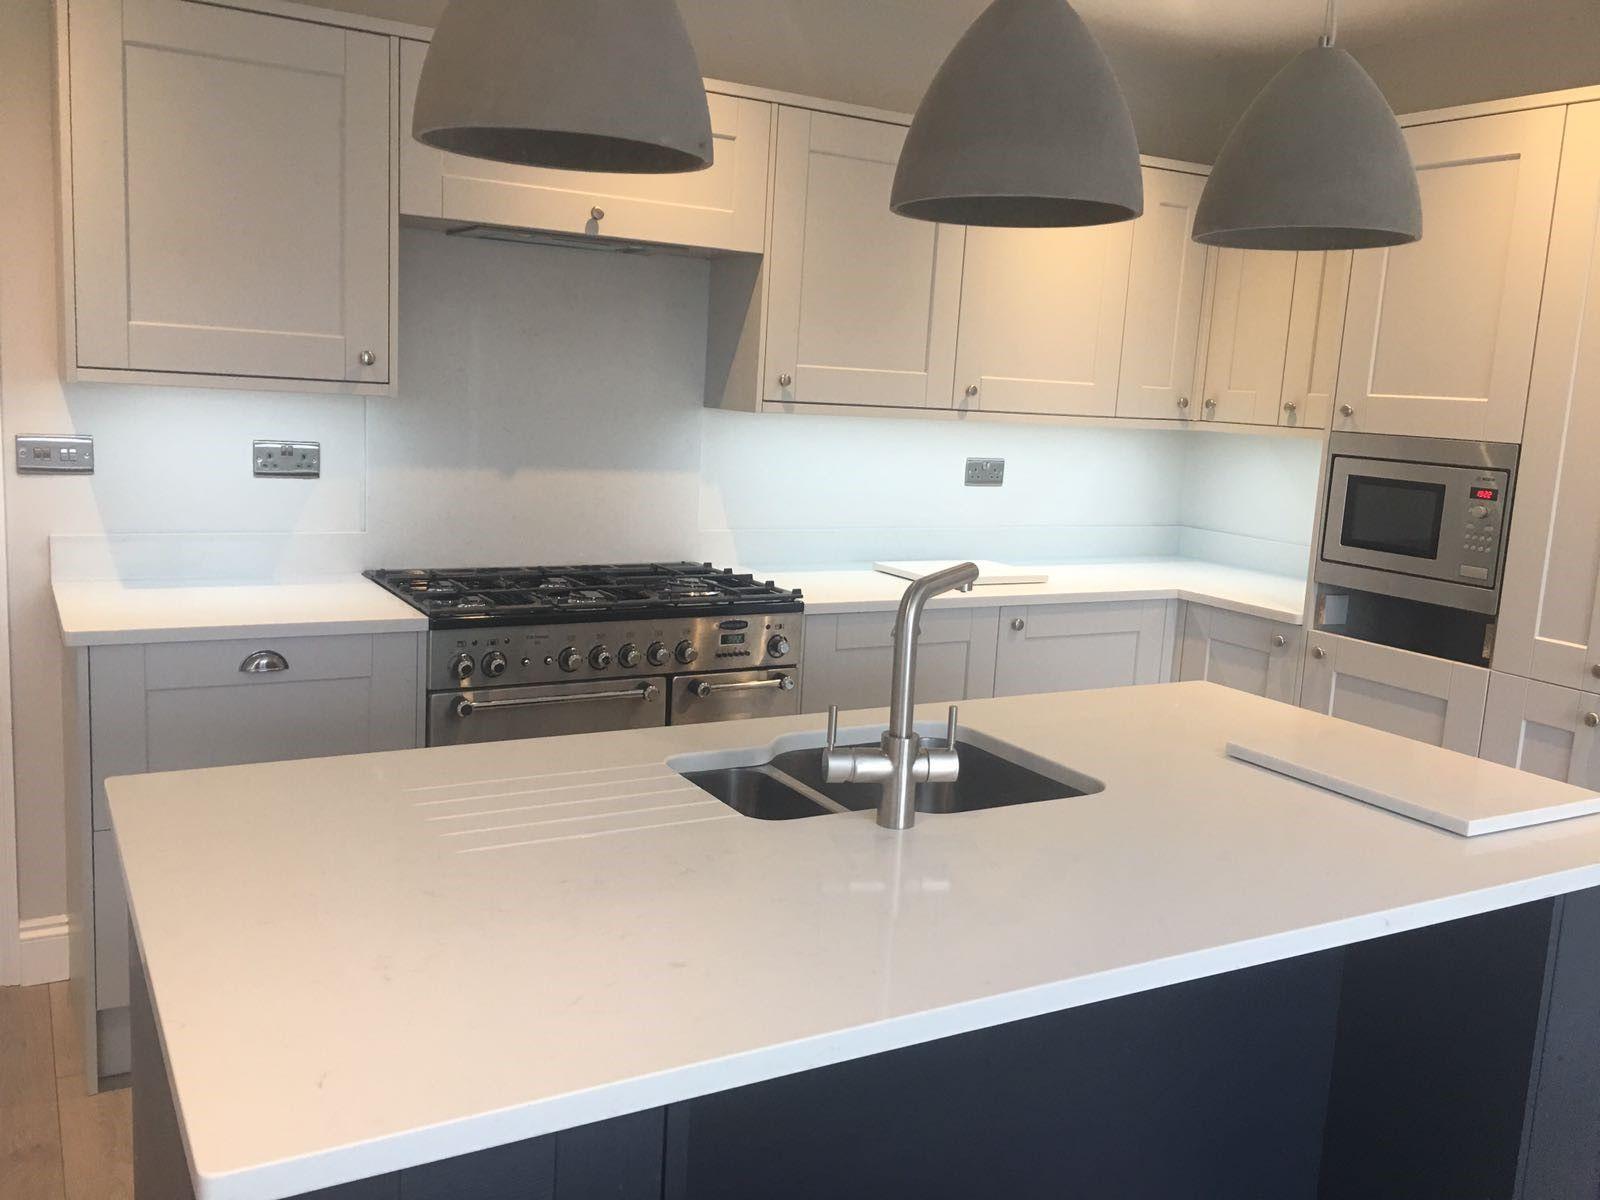 Stunning Cimstone Marble Effect Nebula Carrara Quartz Kitchen